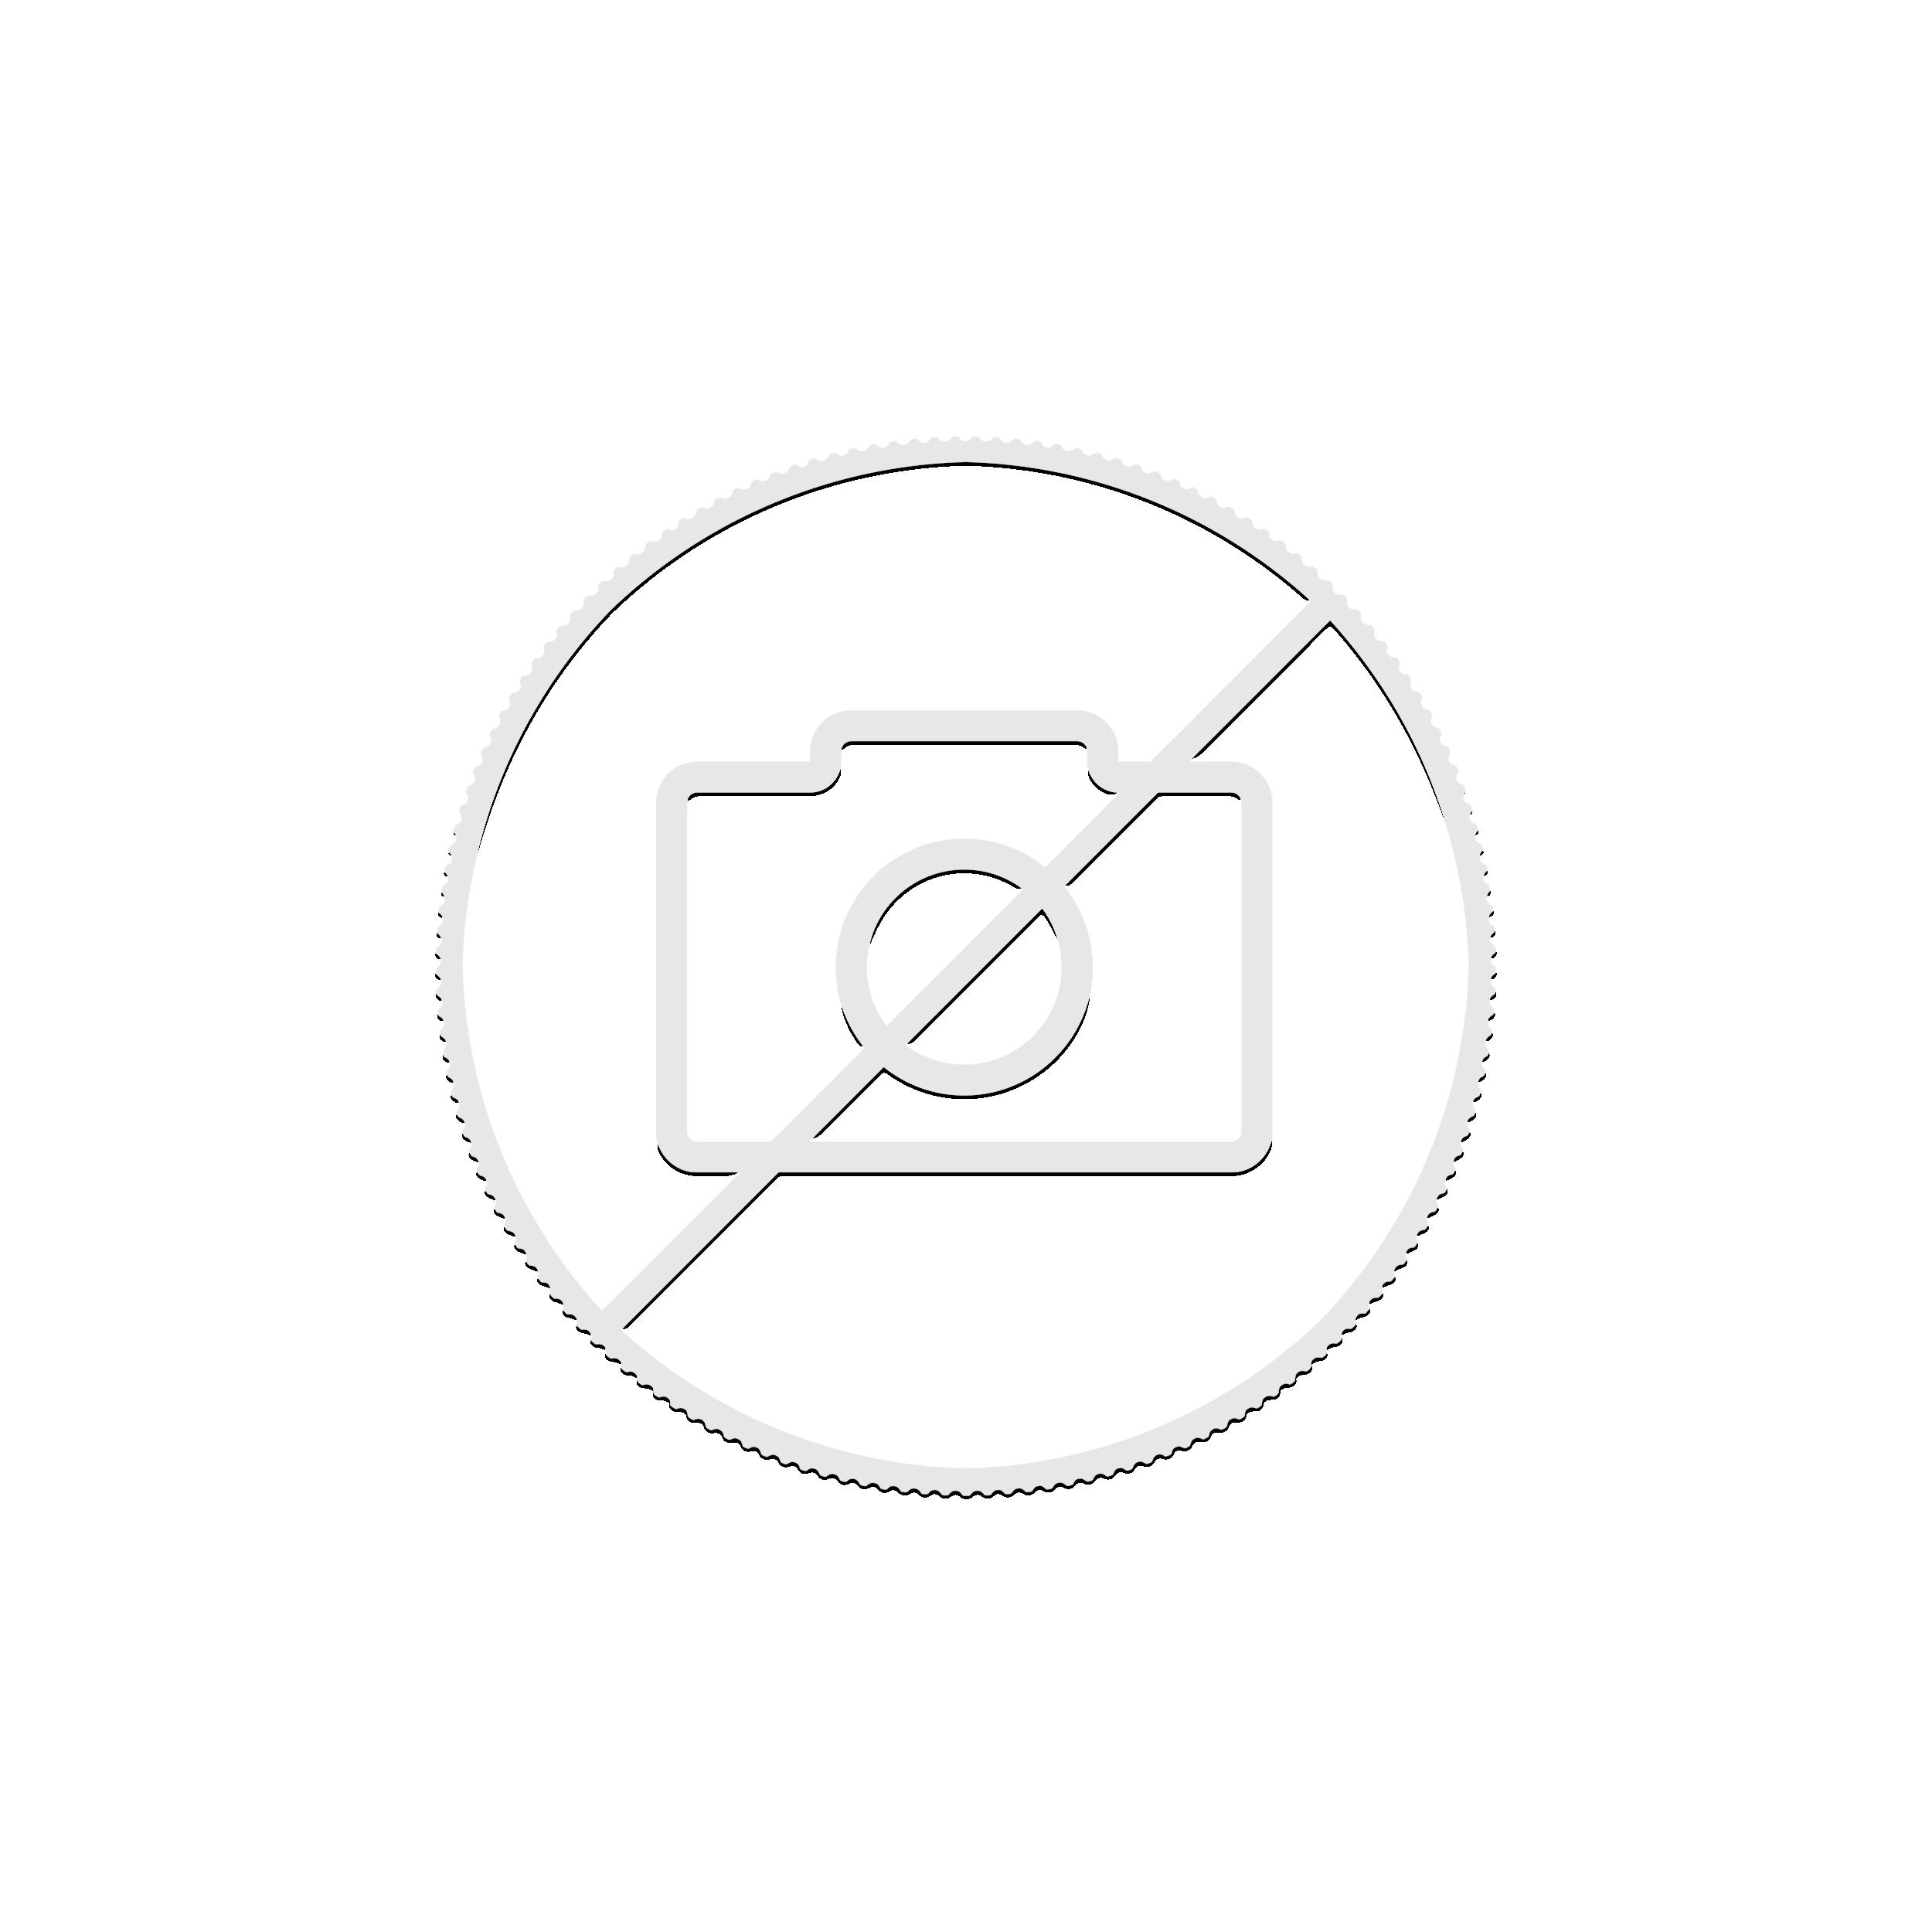 3 troy ounce silver coin Cameroon - Mars 2020